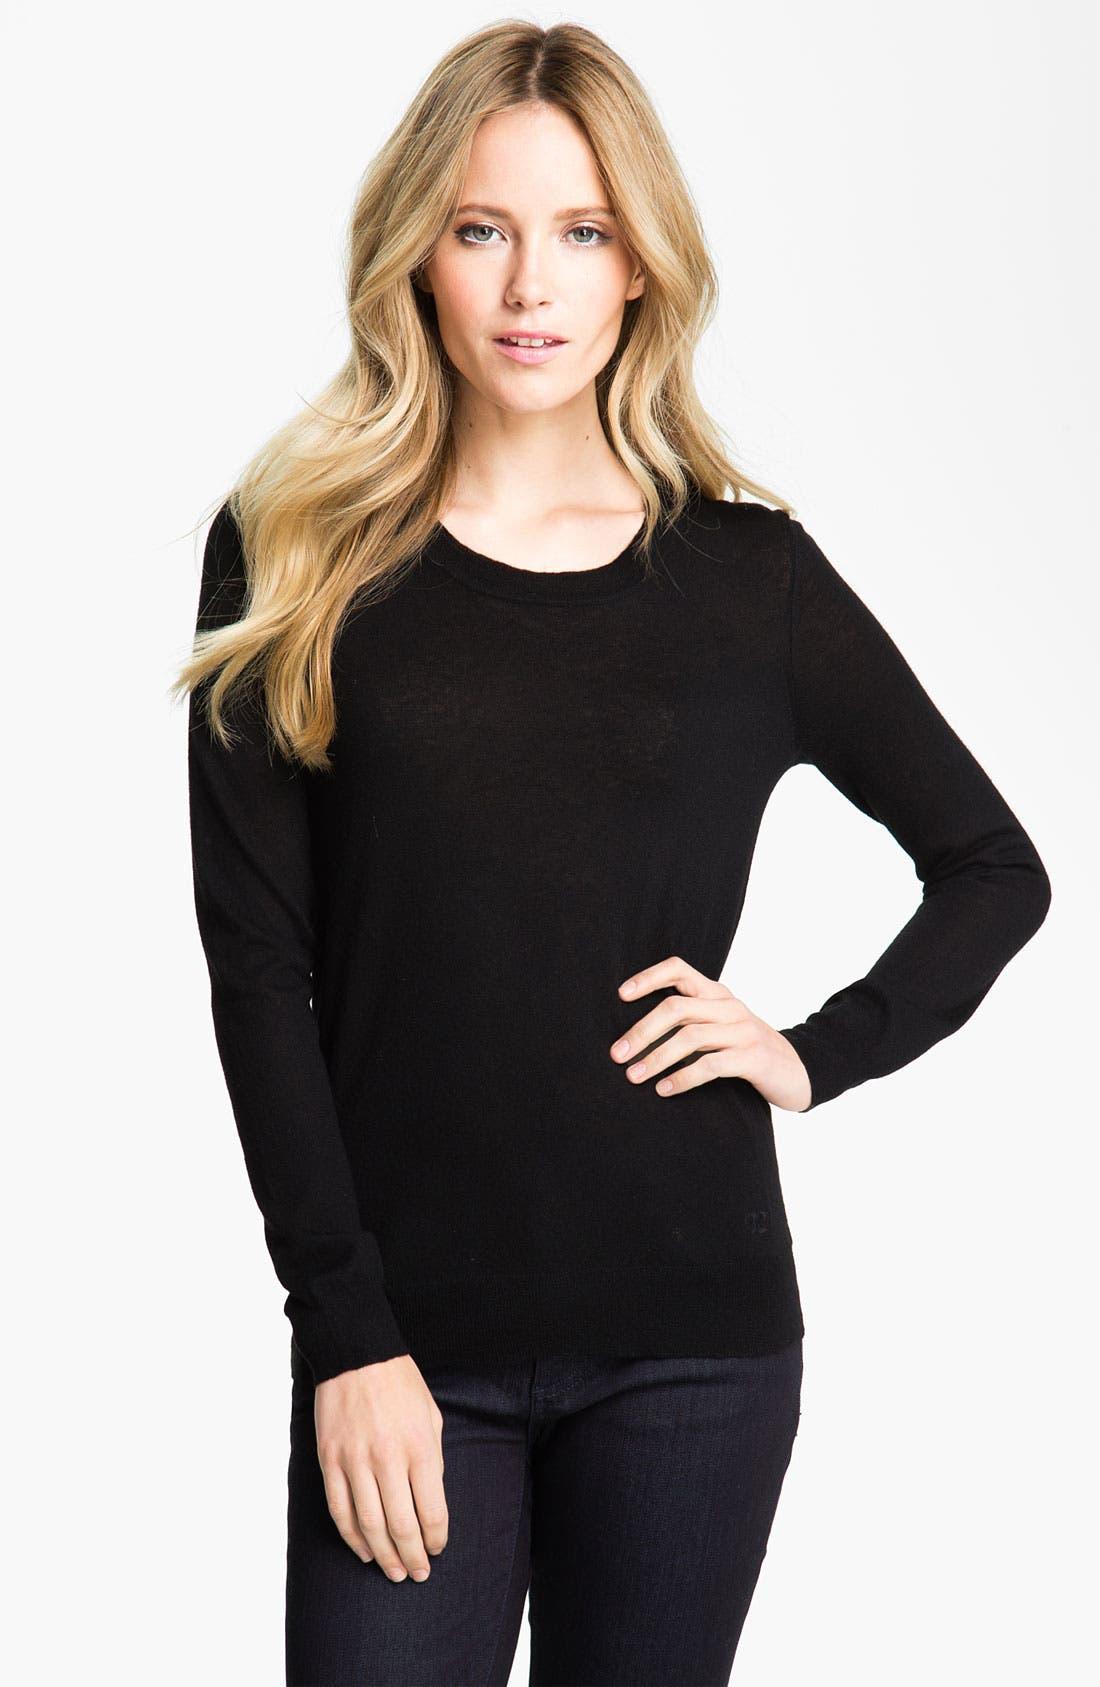 Main Image - Tory Burch 'Iberia' Cashmere Logo Sweater